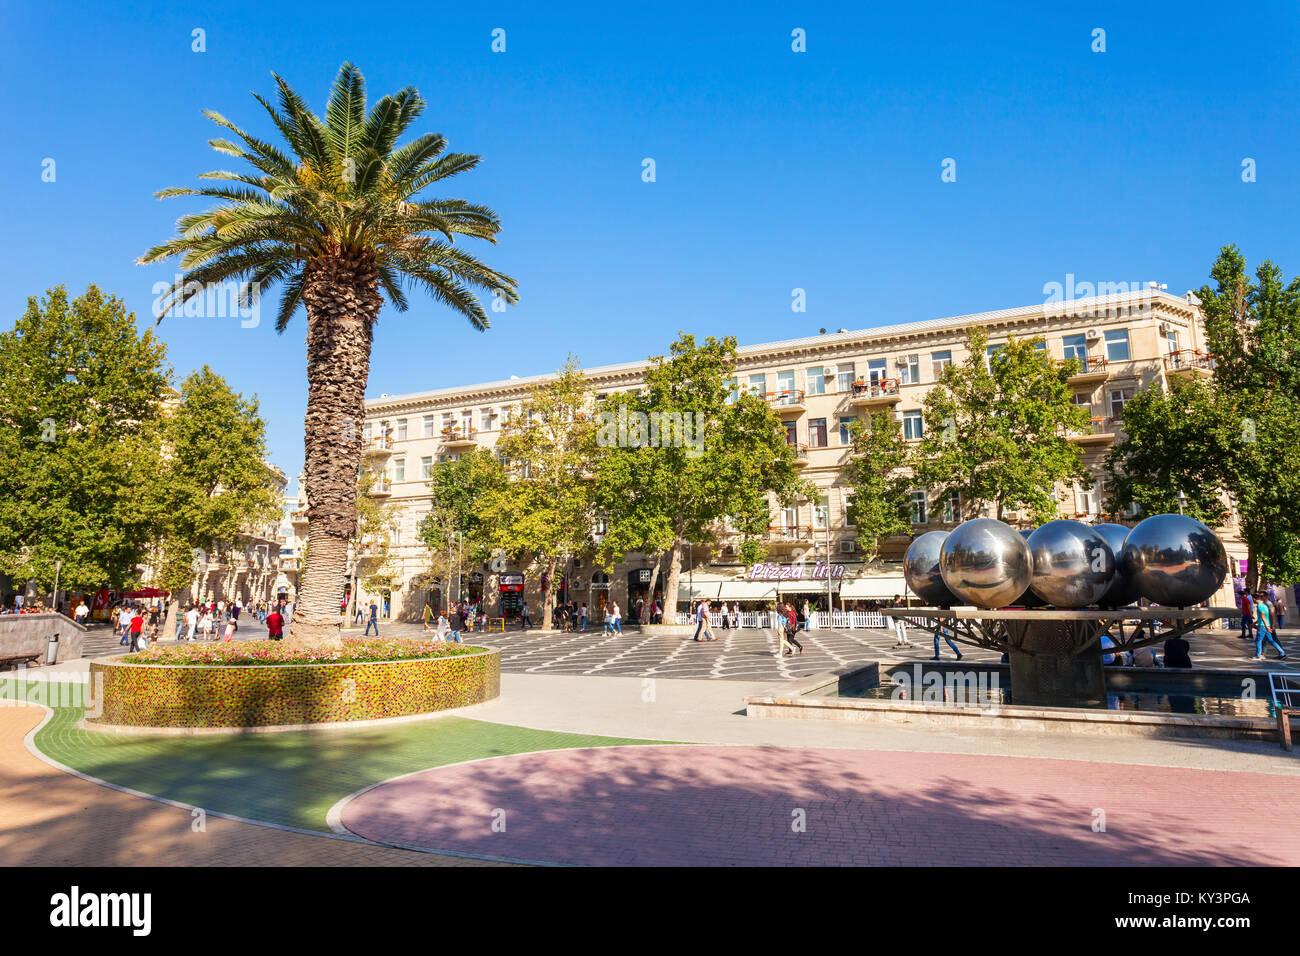 BAKU, AZERBAIJAN - SEPTEMBER 14, 2016: Fountains or Parapet Square is a public square in downtown Baku, capital - Stock Image